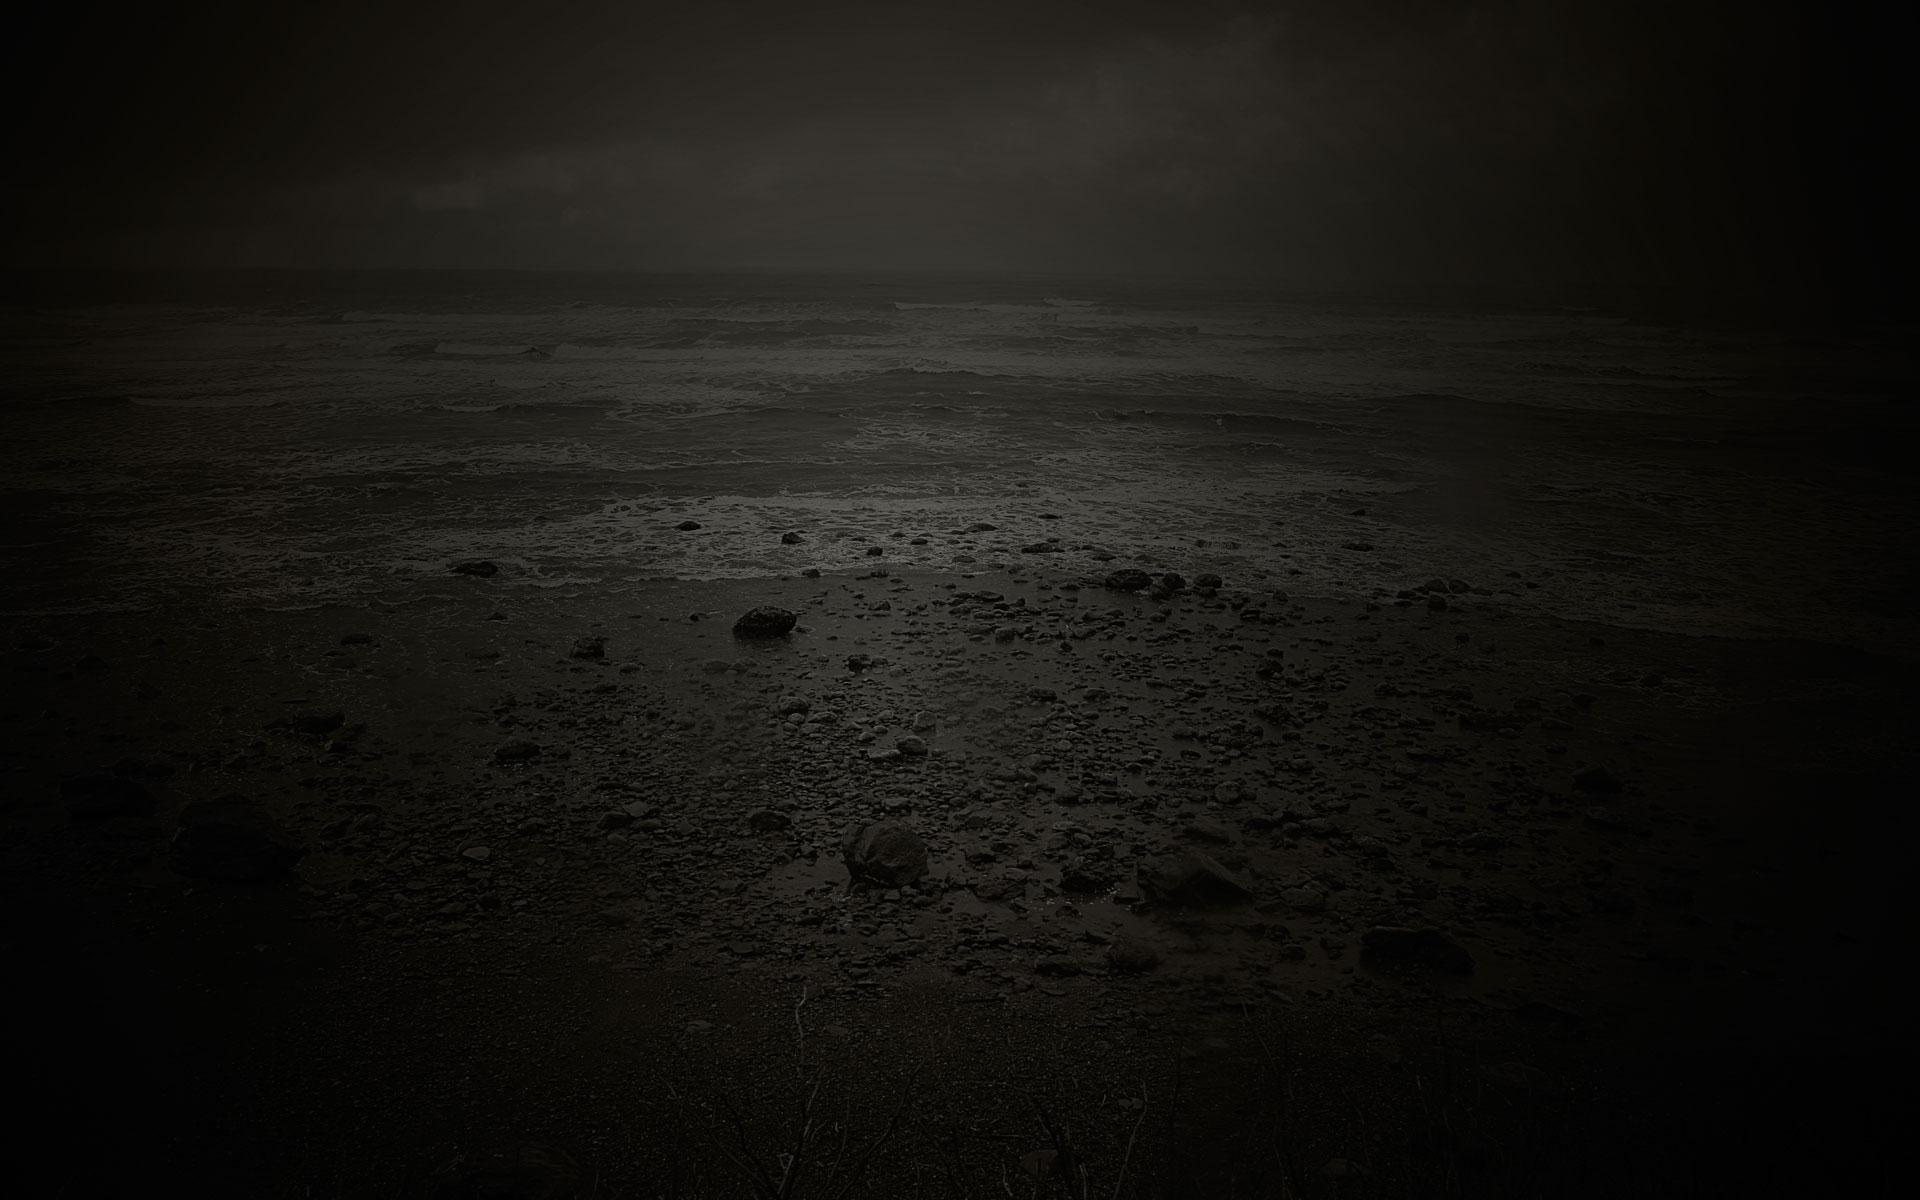 beach-depressing_00271608